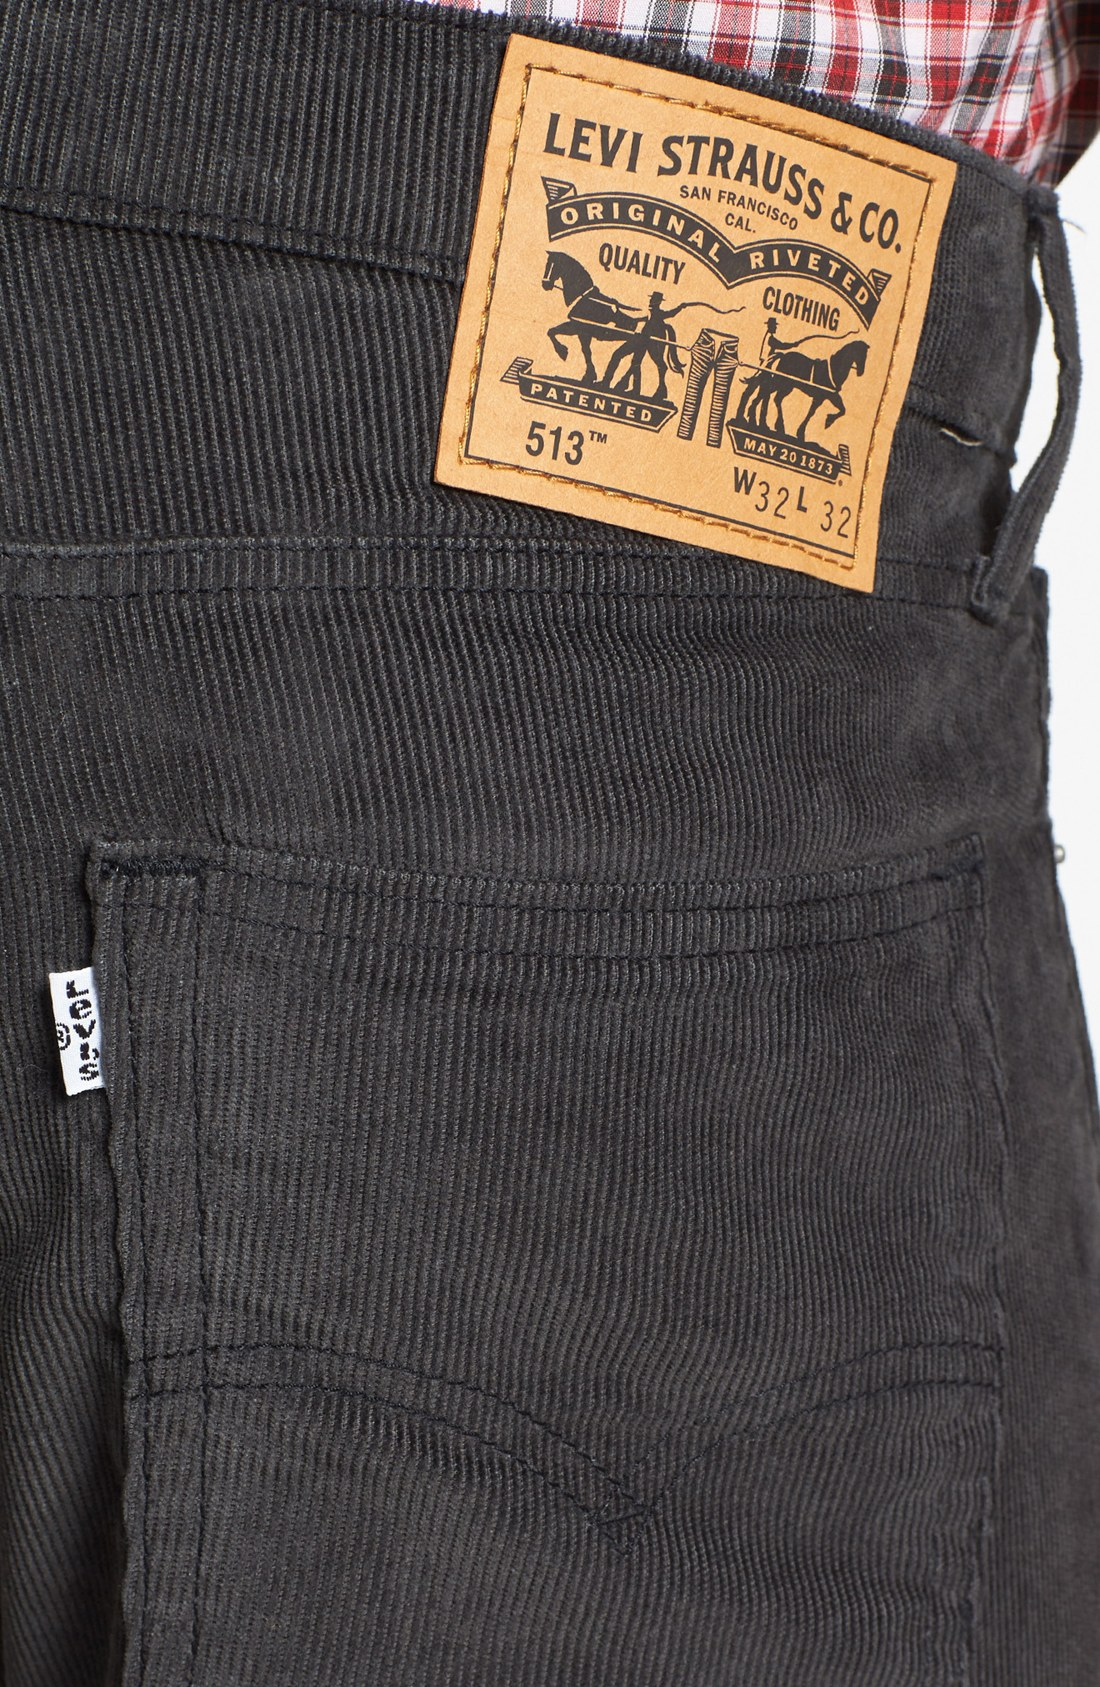 bdc6b8f5 Levi's 513 Slim Straight Leg Corduroy Pants in Gray for Men (Graphite .